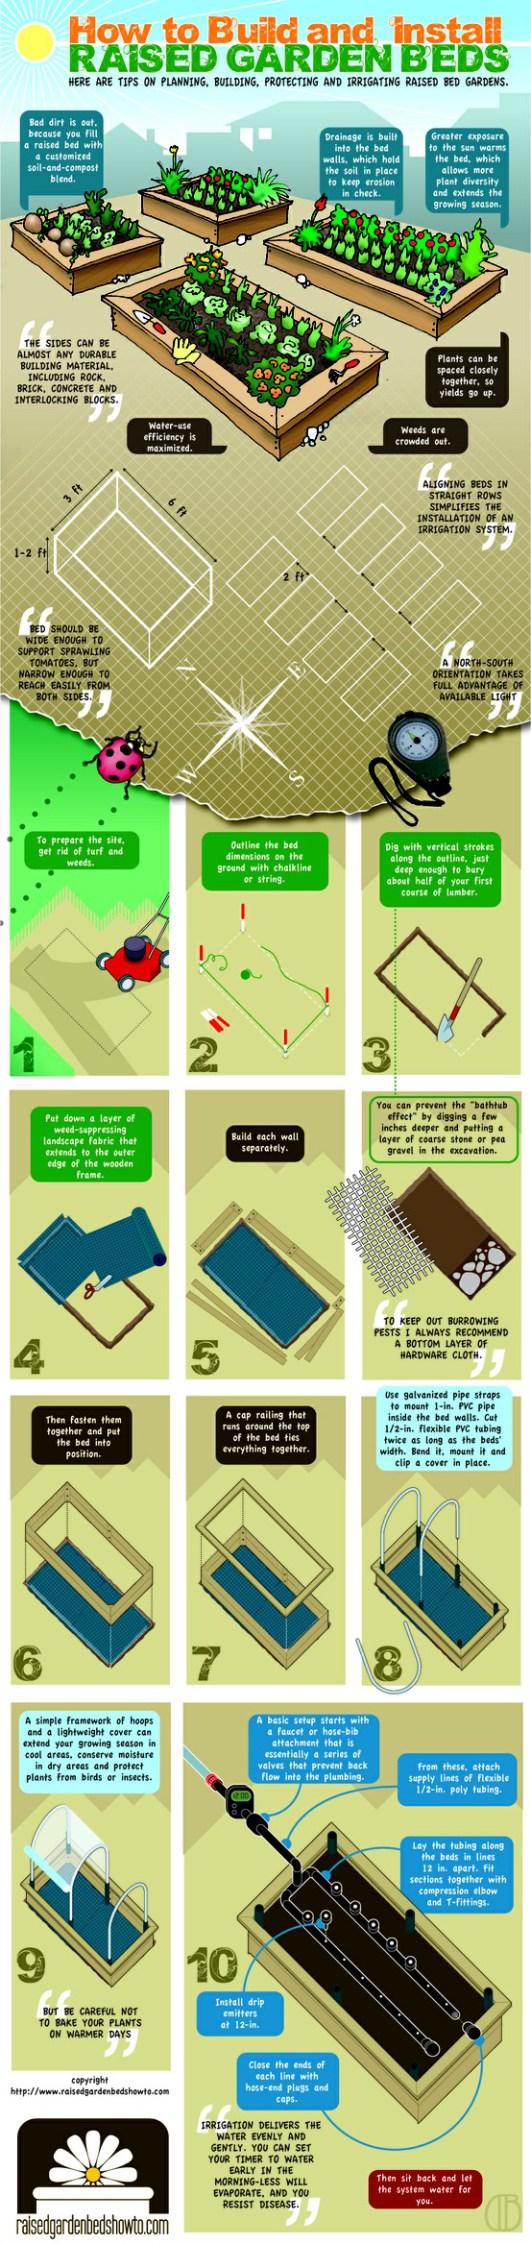 how-to-build-raised-garden